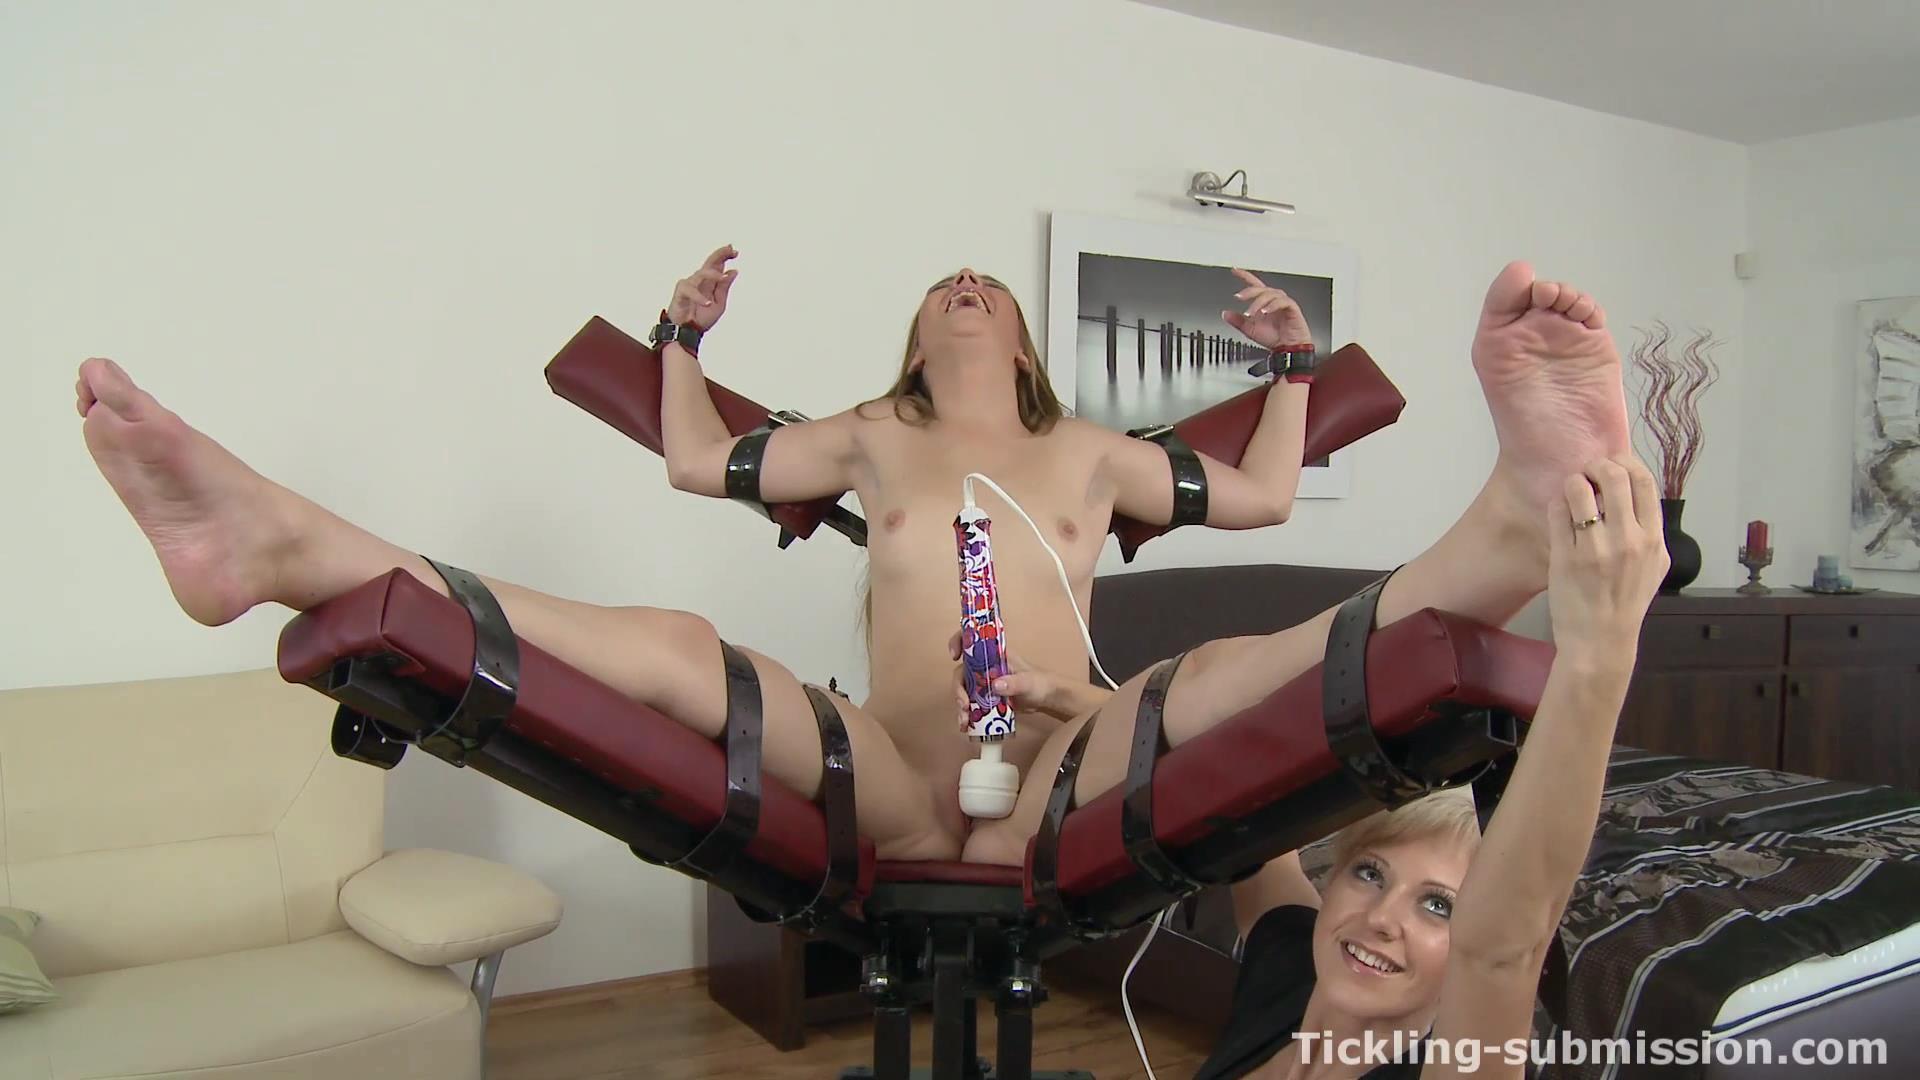 Free F F Tickle Porn Galery